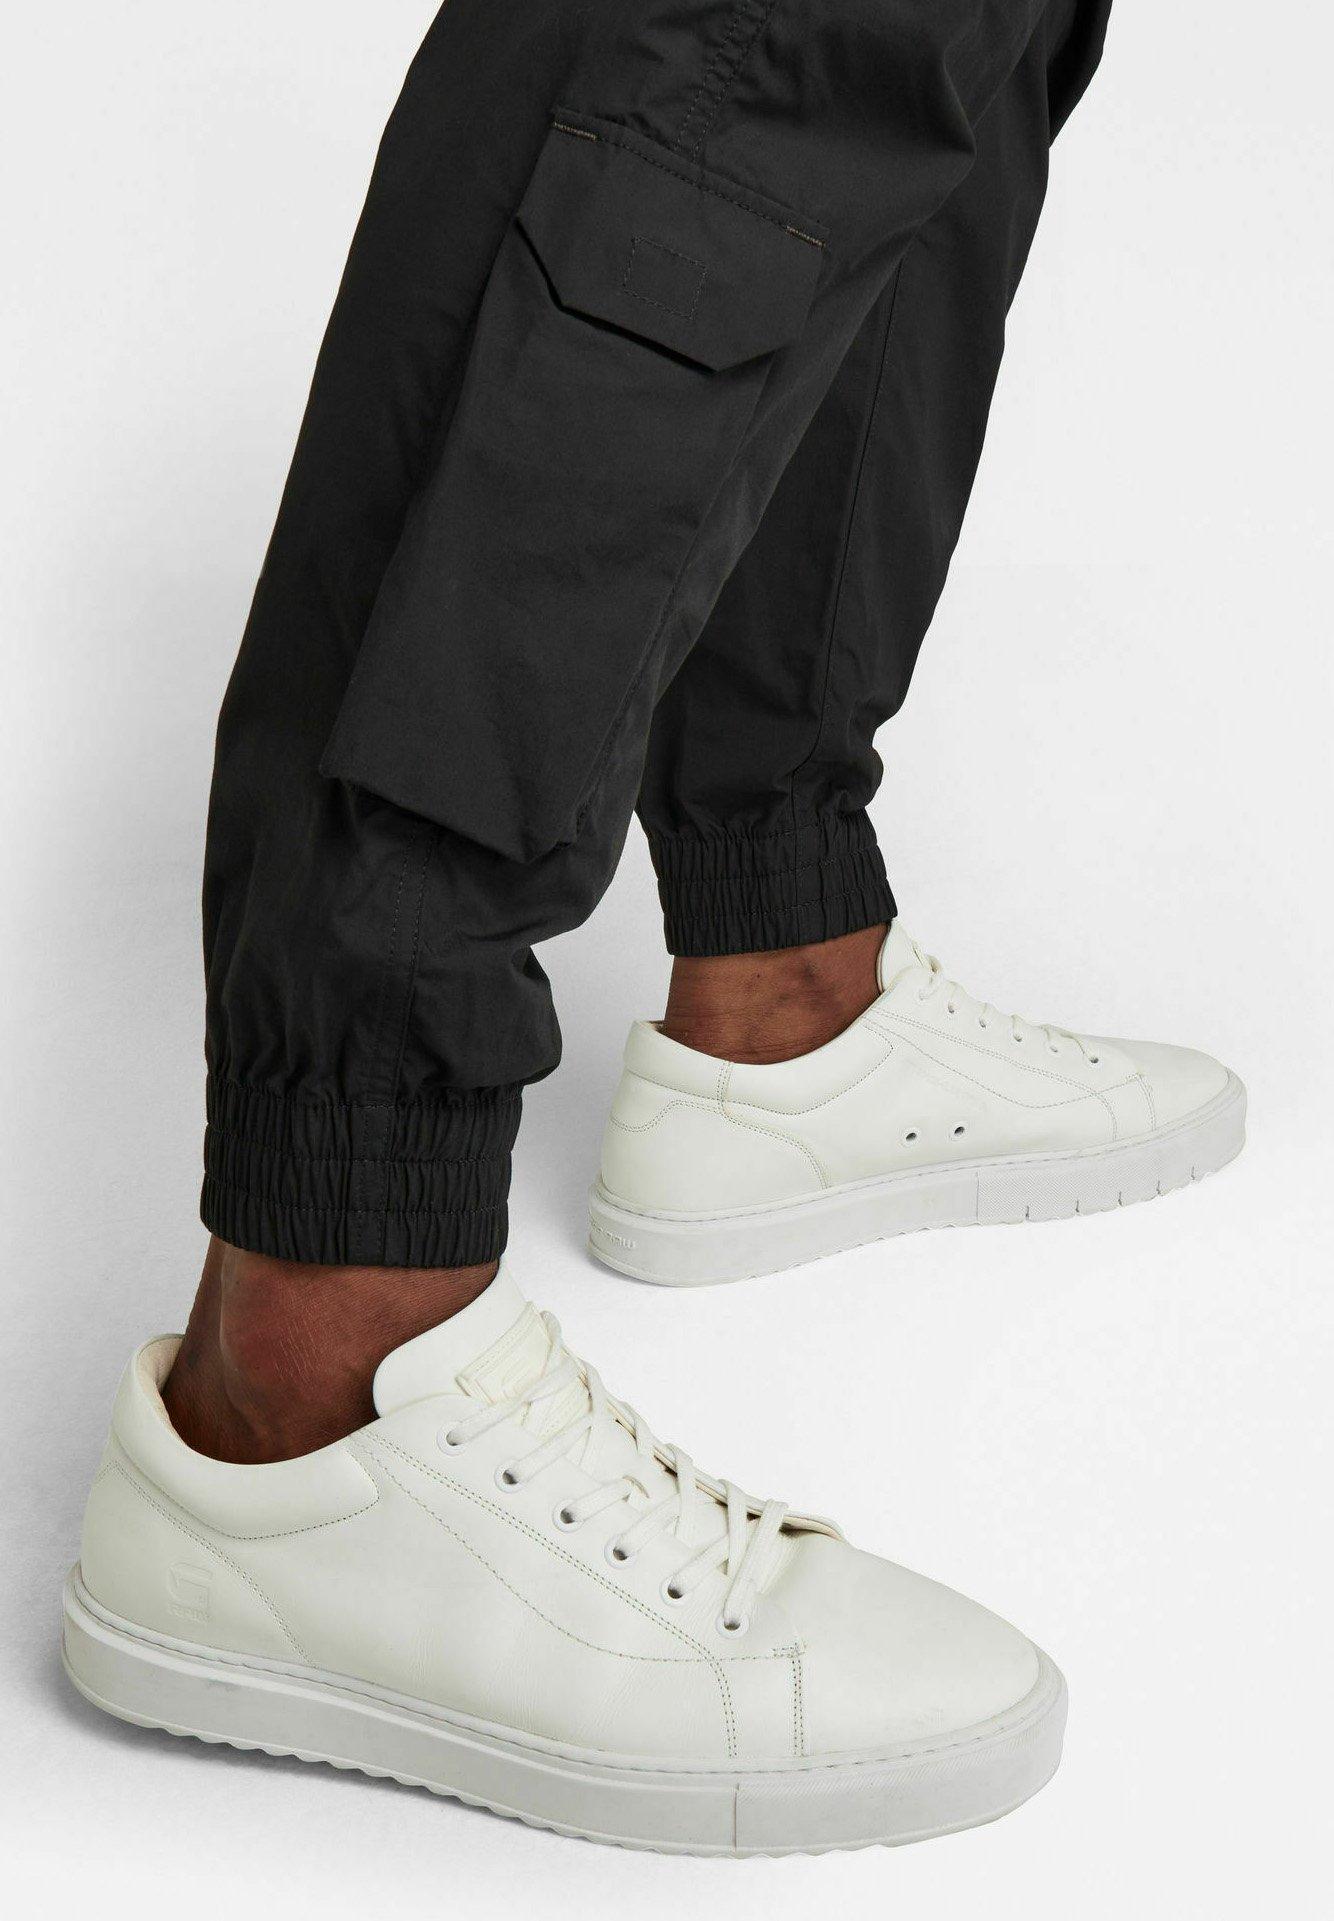 Homme CHINO - Pantalon cargo